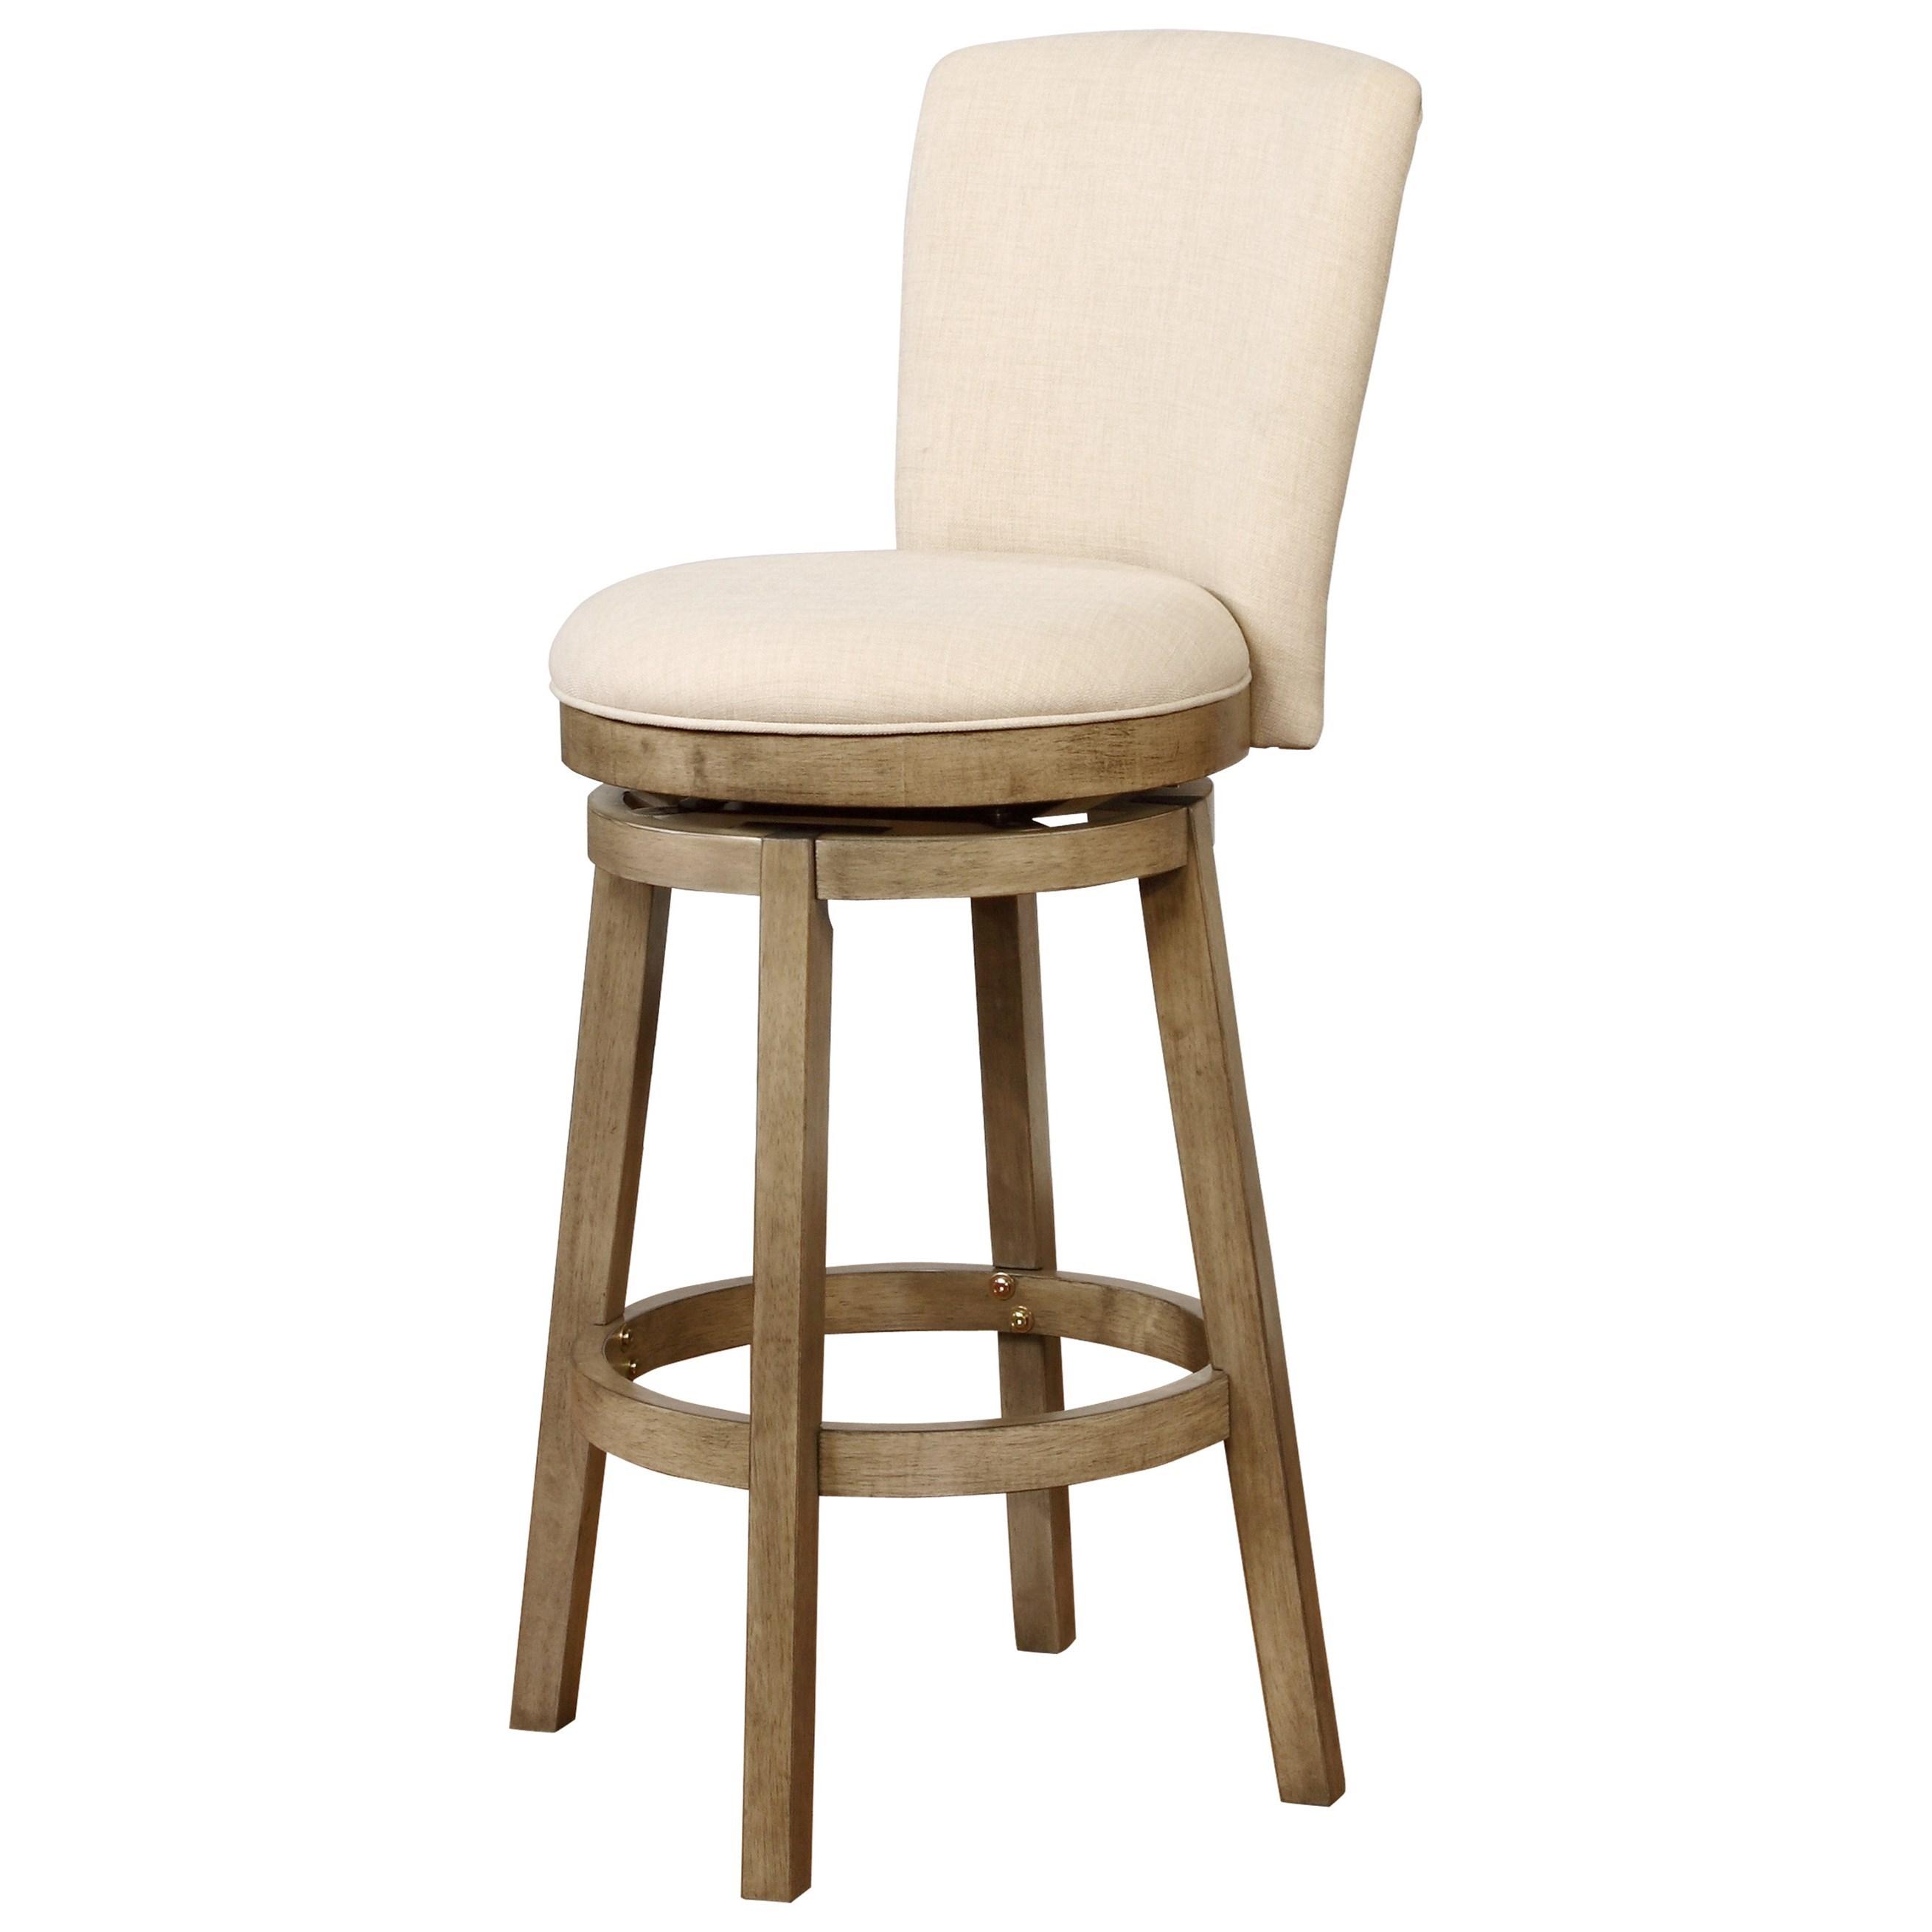 Powell Bar Stools Amp Tables Davis Upholstered Barstool